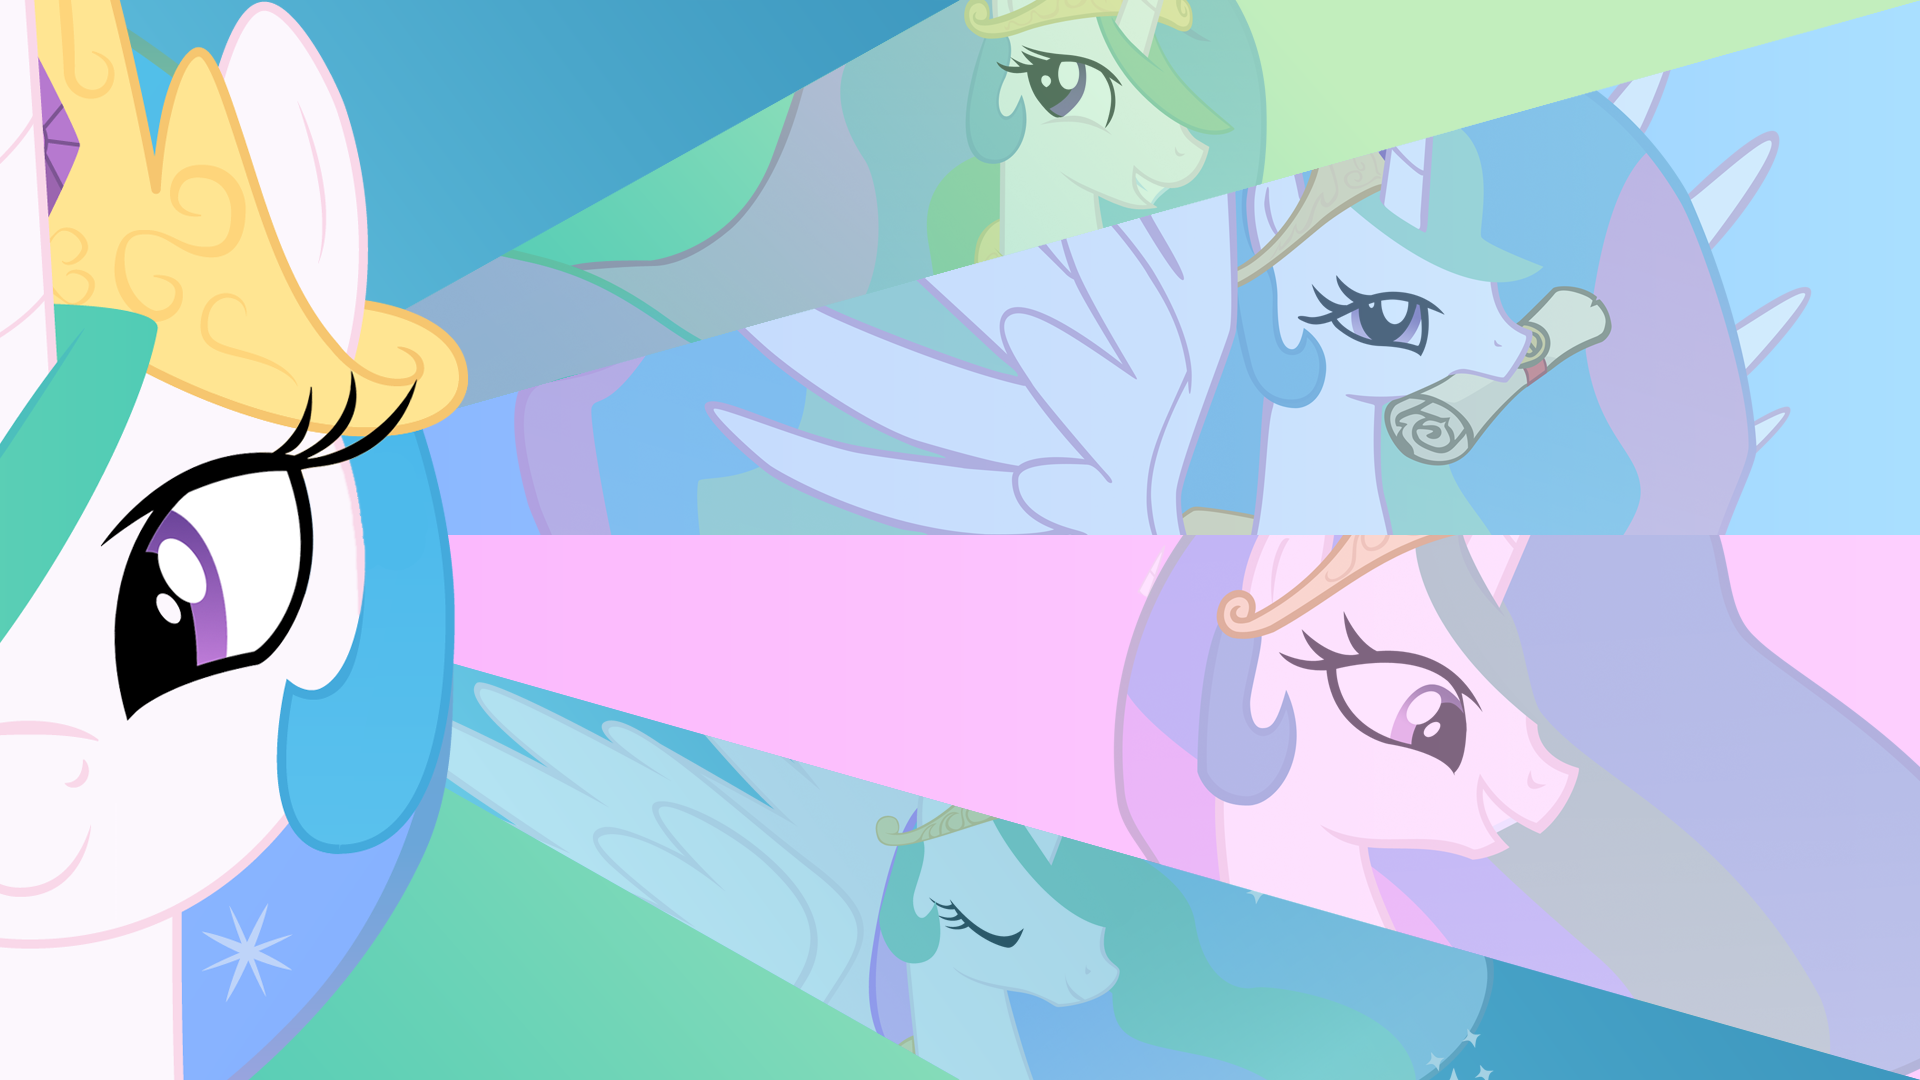 Princess Celestia Wallpaper by Blackm3sh, BlueDragonHans, Jamy-Jamy, Juicy-Cactus, KeinZantezuken and Vexorb